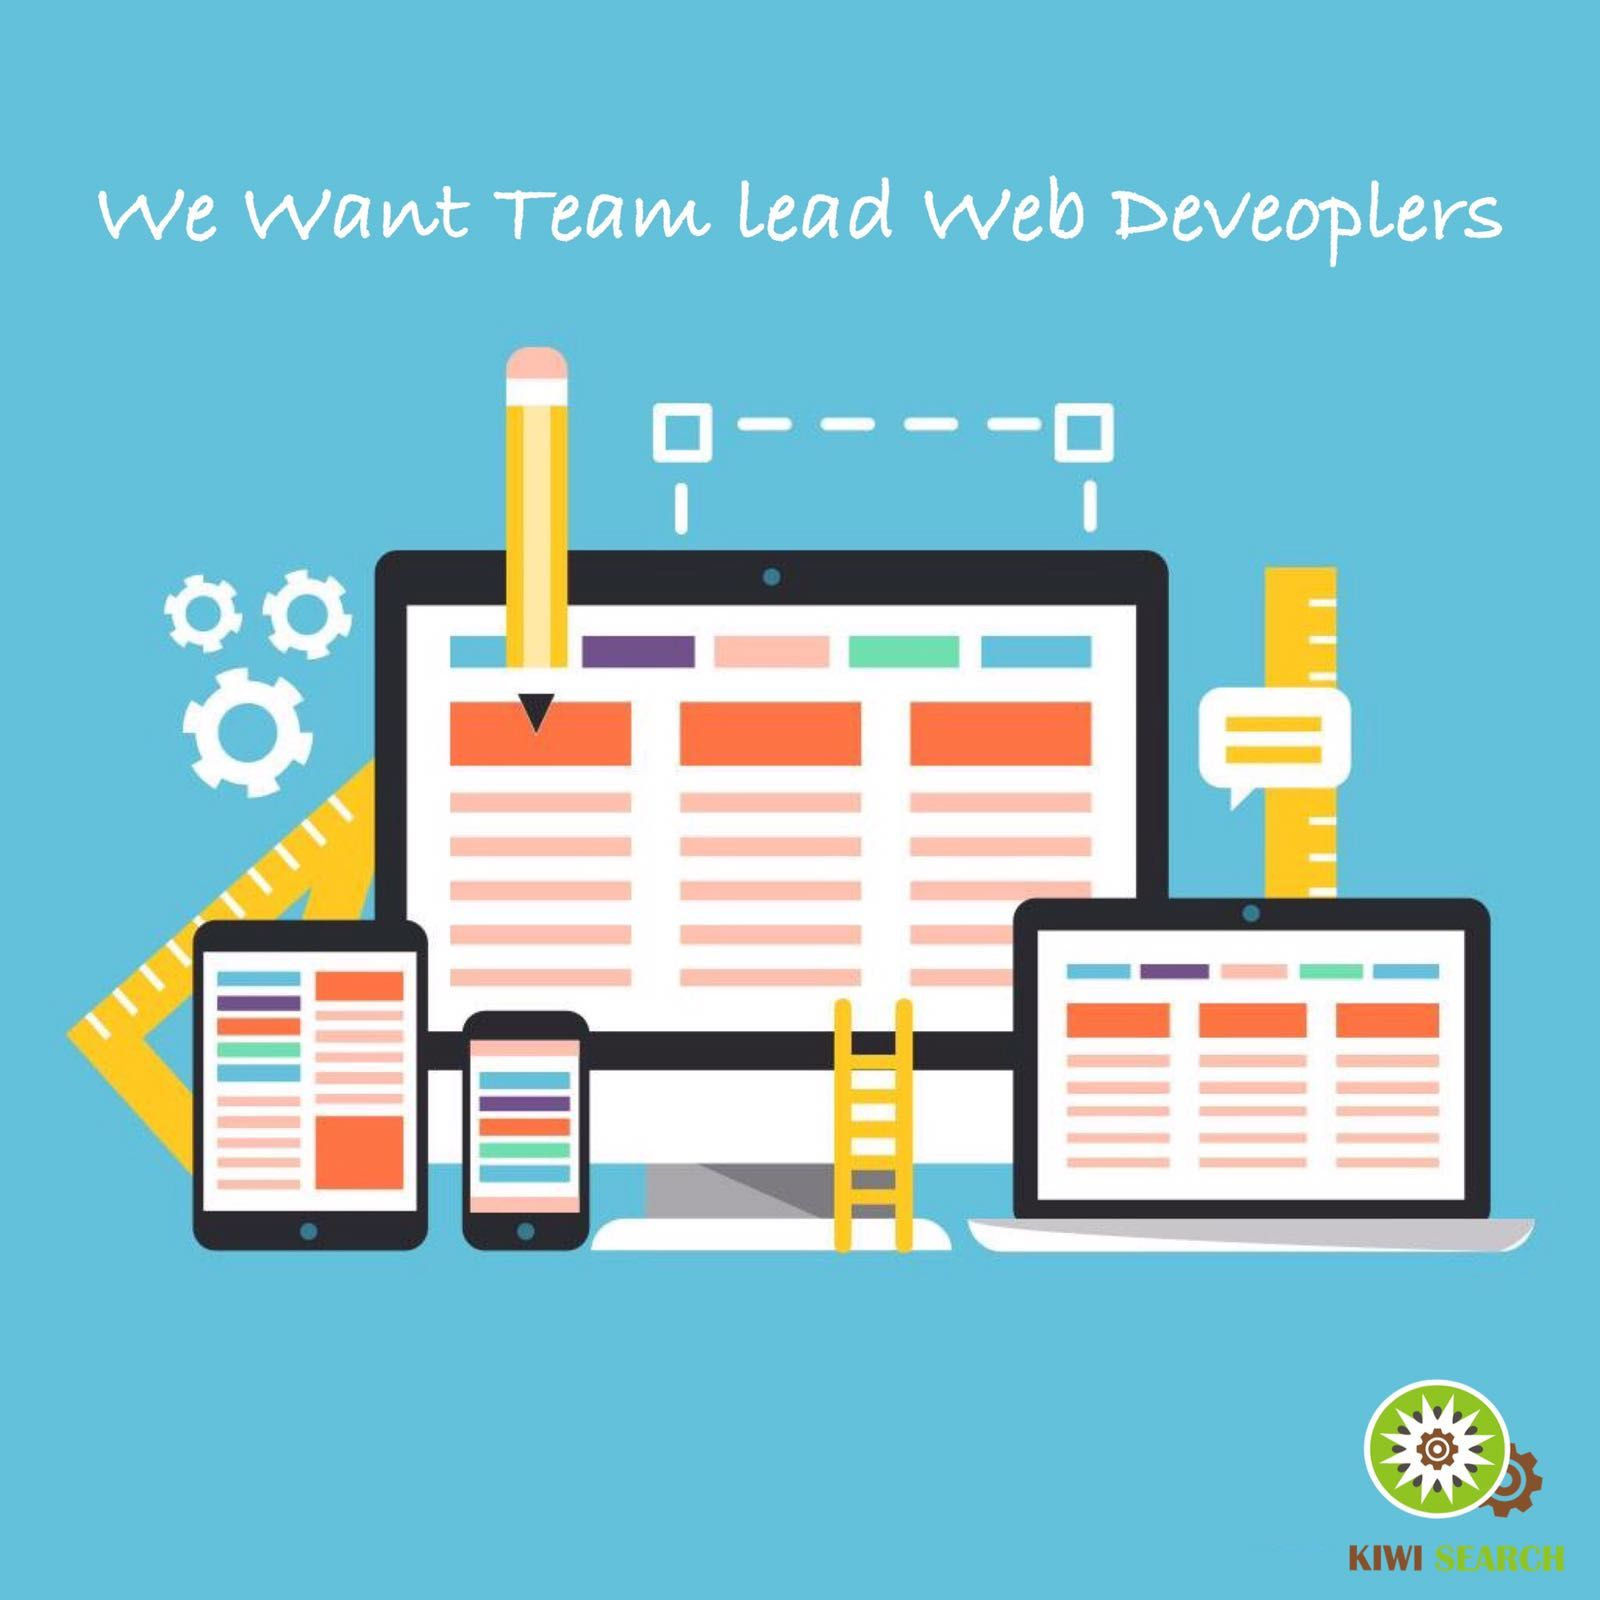 Team lead web development work life balance httpskiwi search team lead web development work life balance httpskiwi baditri Images